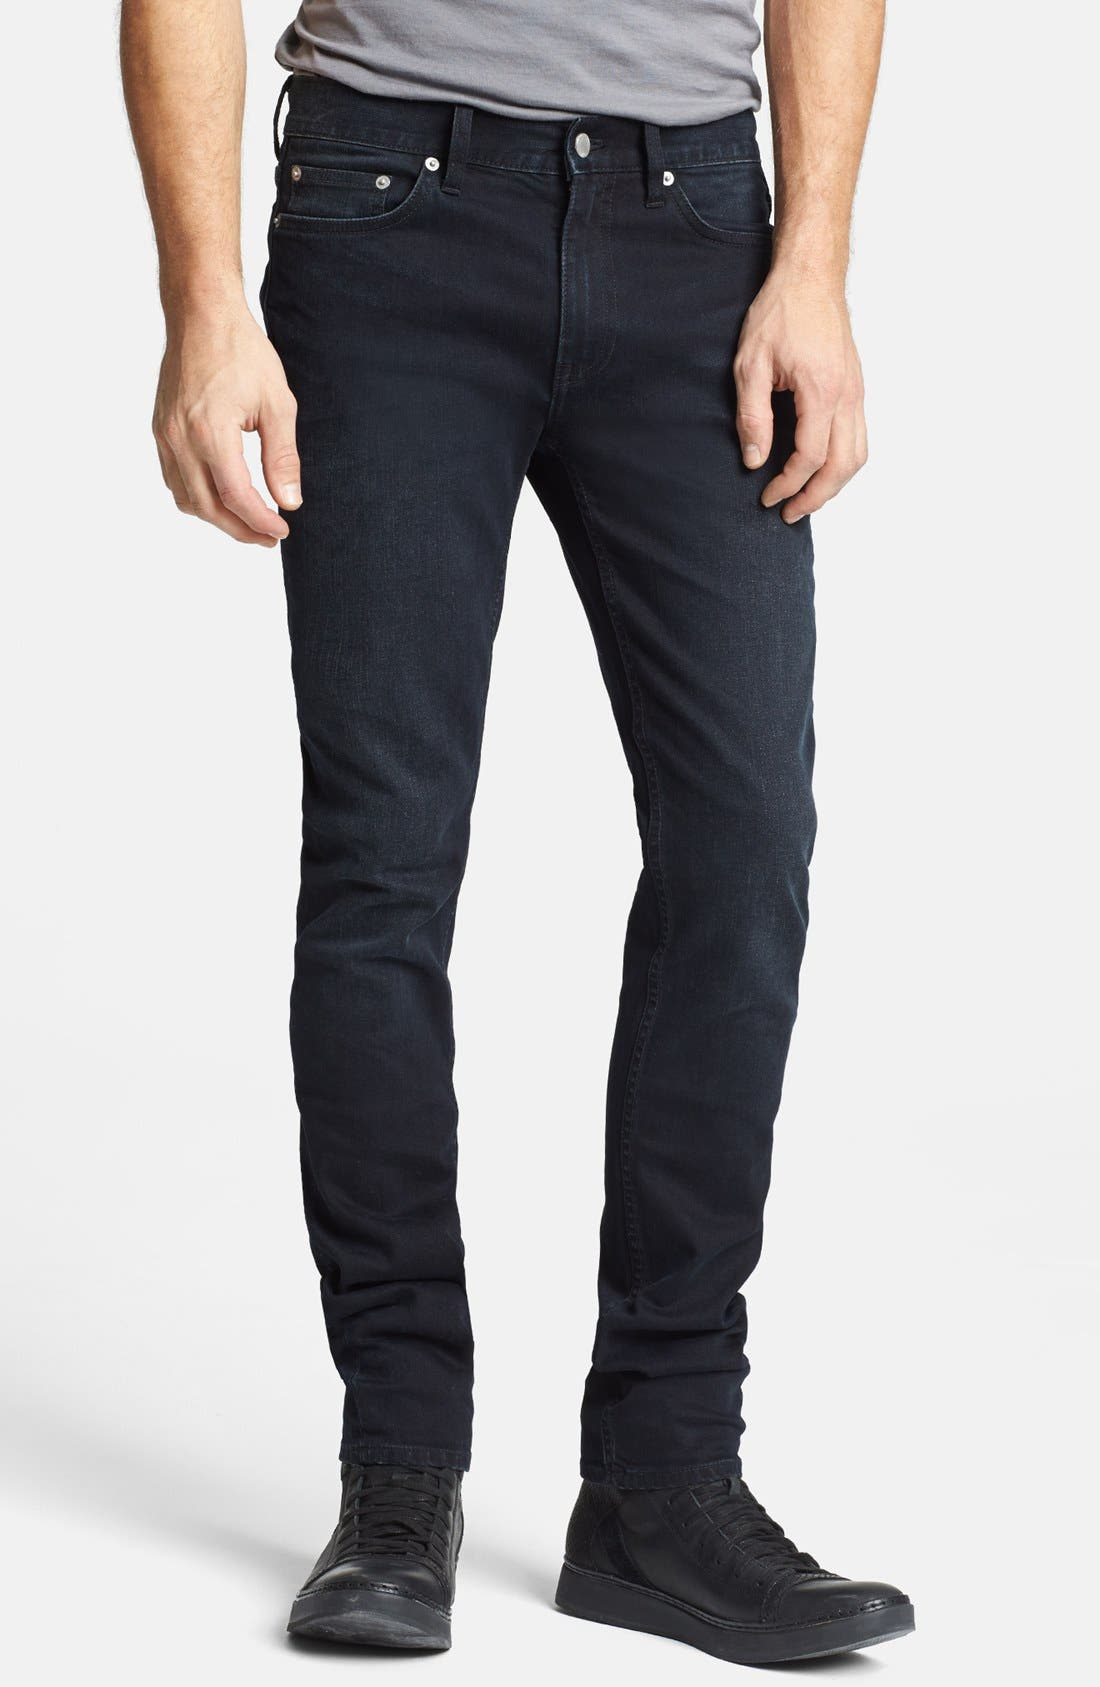 Alternate Image 1 Selected - BLK DNM 'Jeans 5' Slim Straight Leg Jeans (Beekman Black)